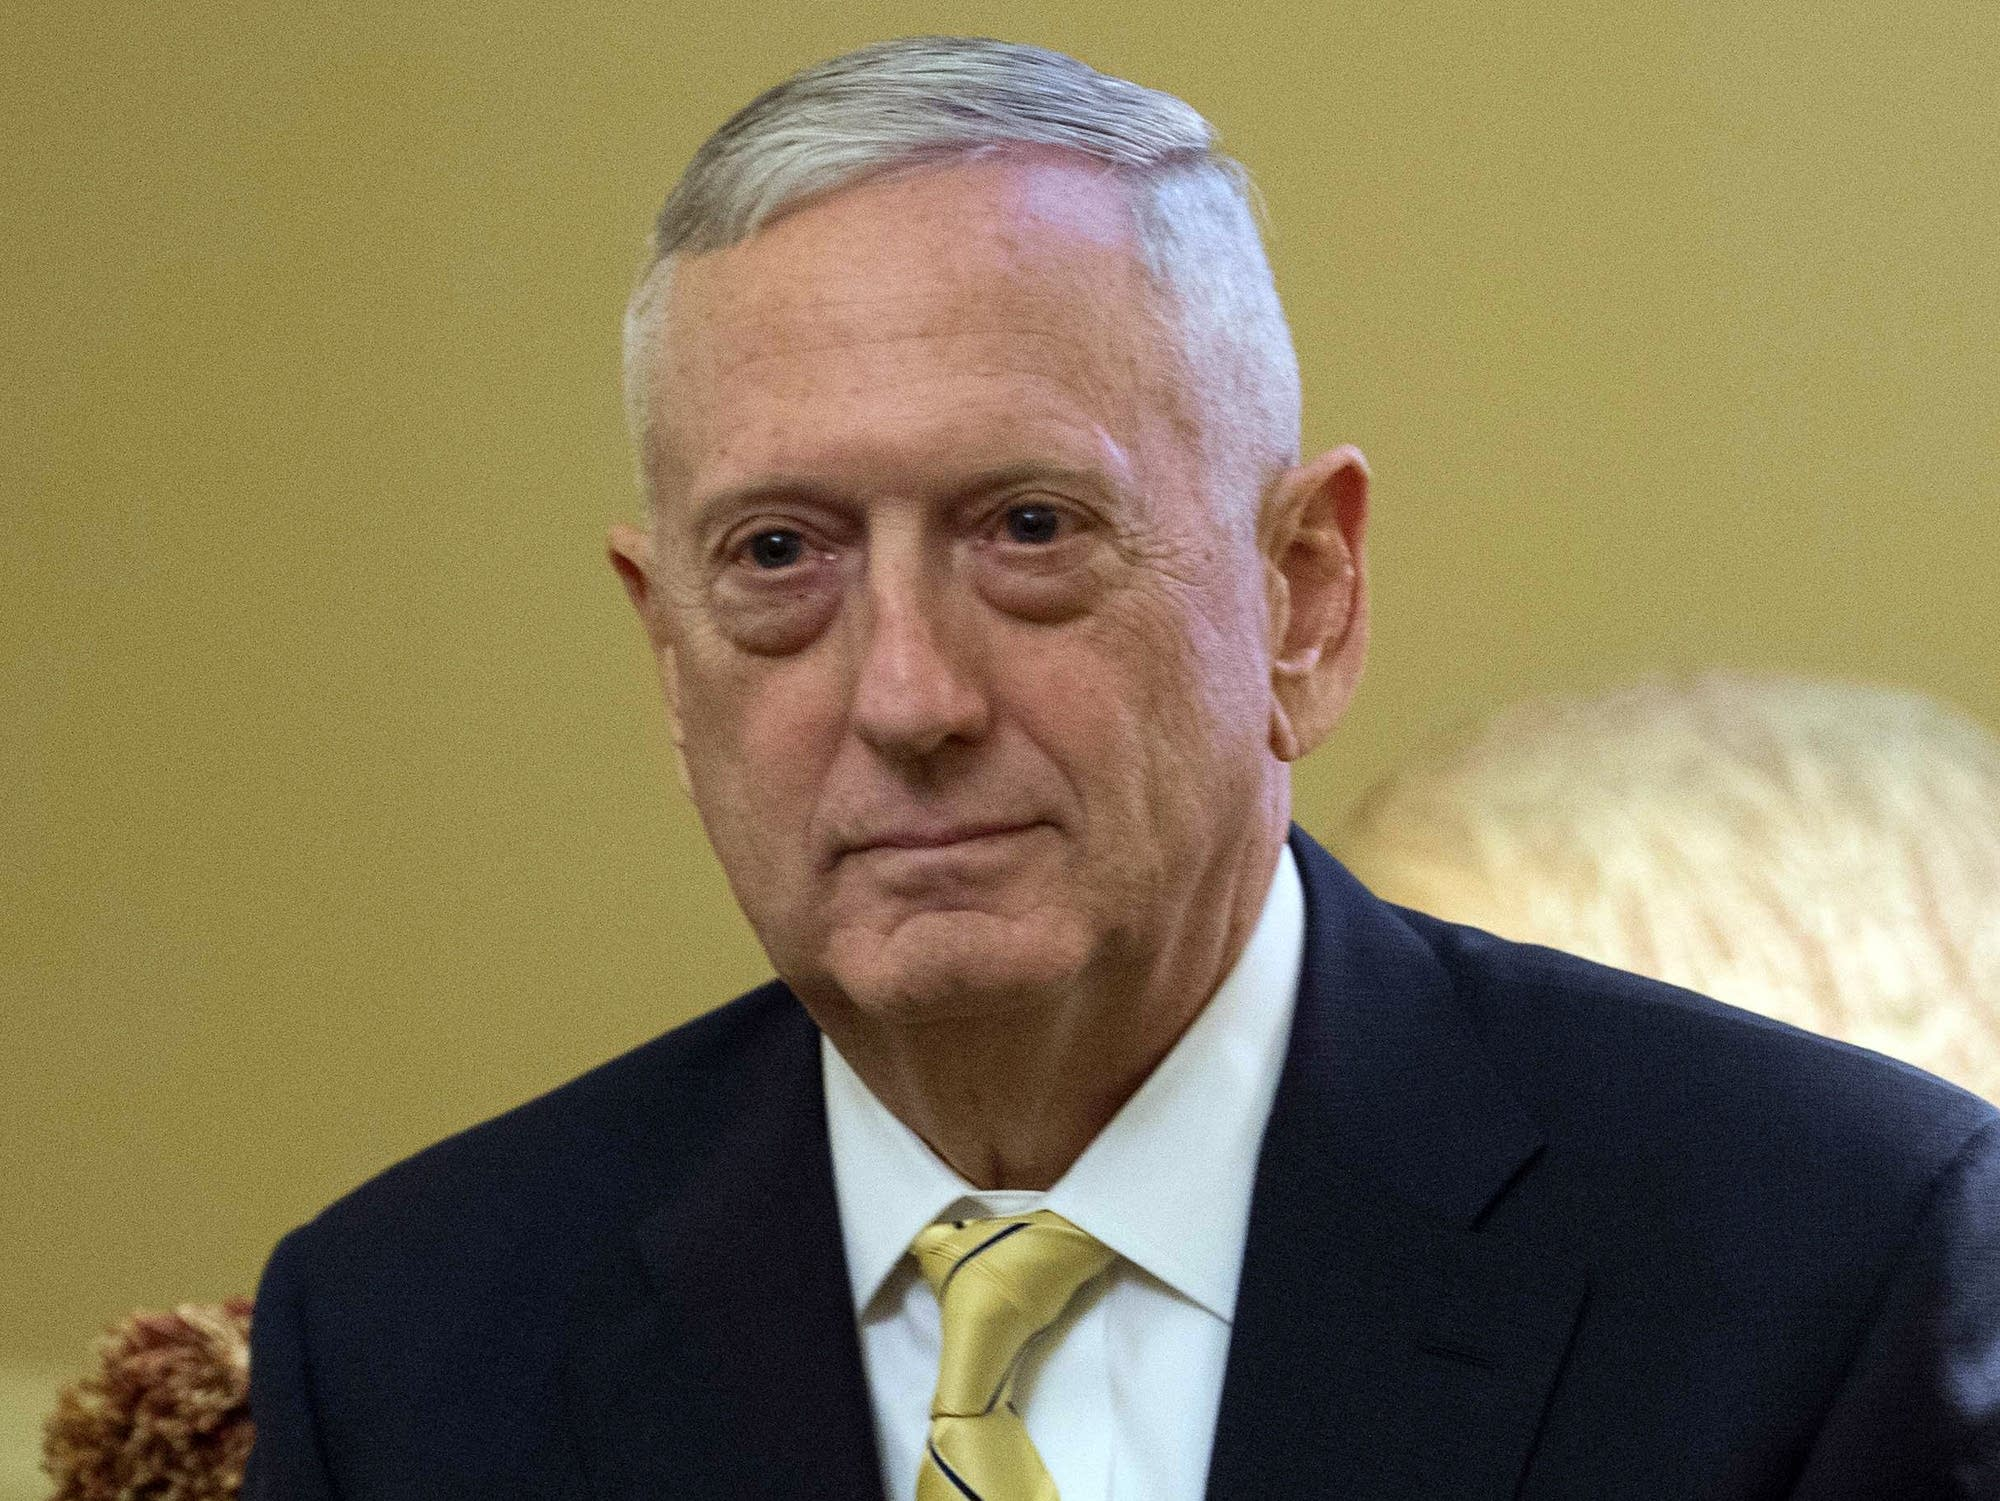 U.S. Defense Secretary nominee James Mattis